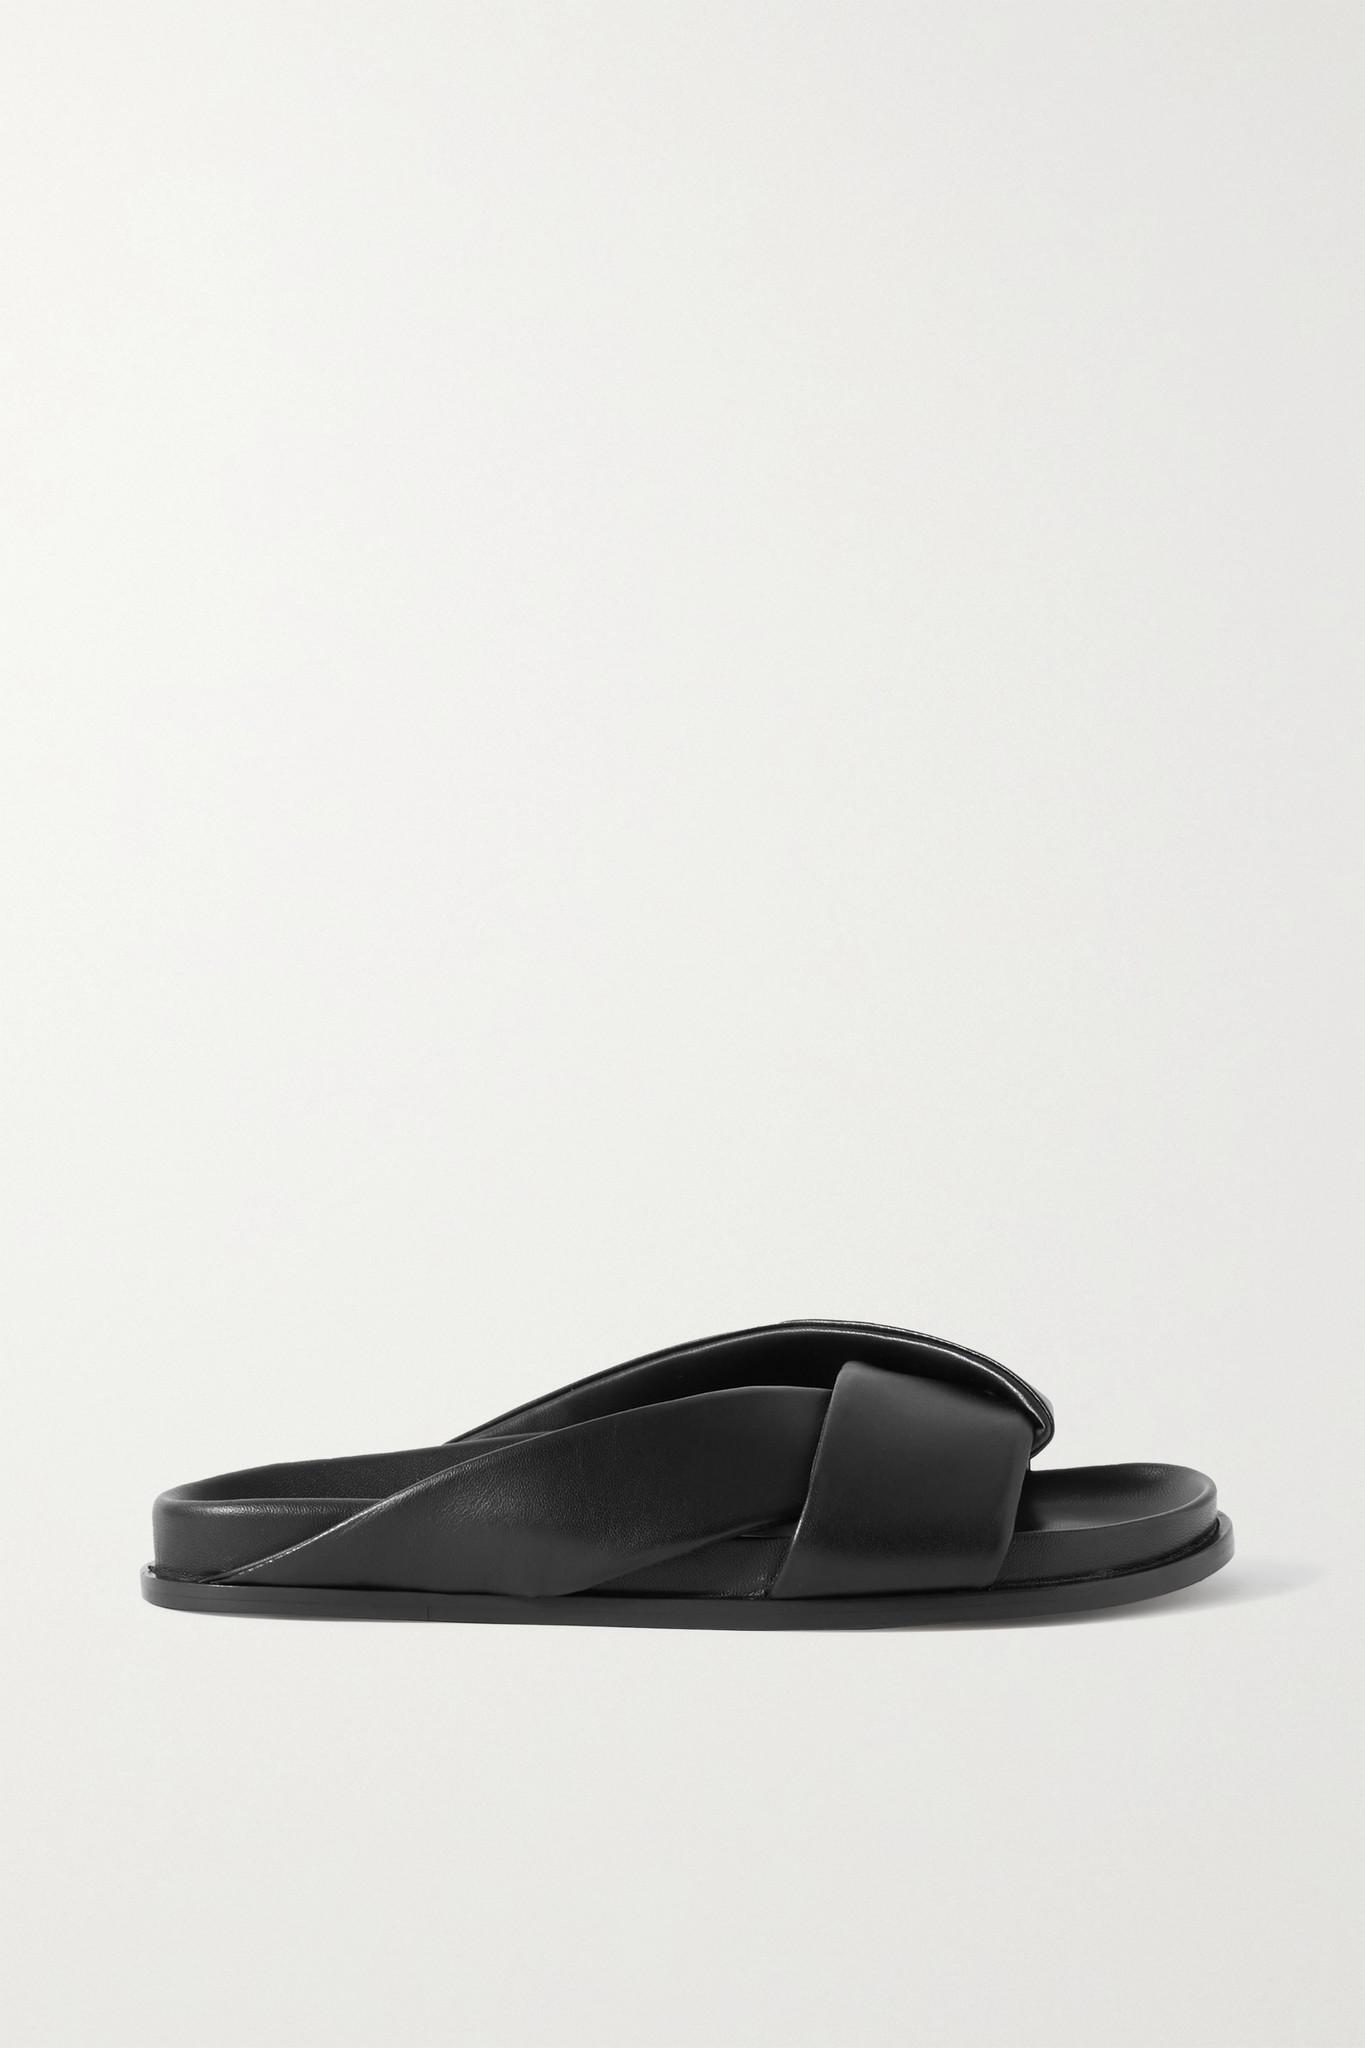 EMME PARSONS - 皮革拖鞋 - 黑色 - IT38